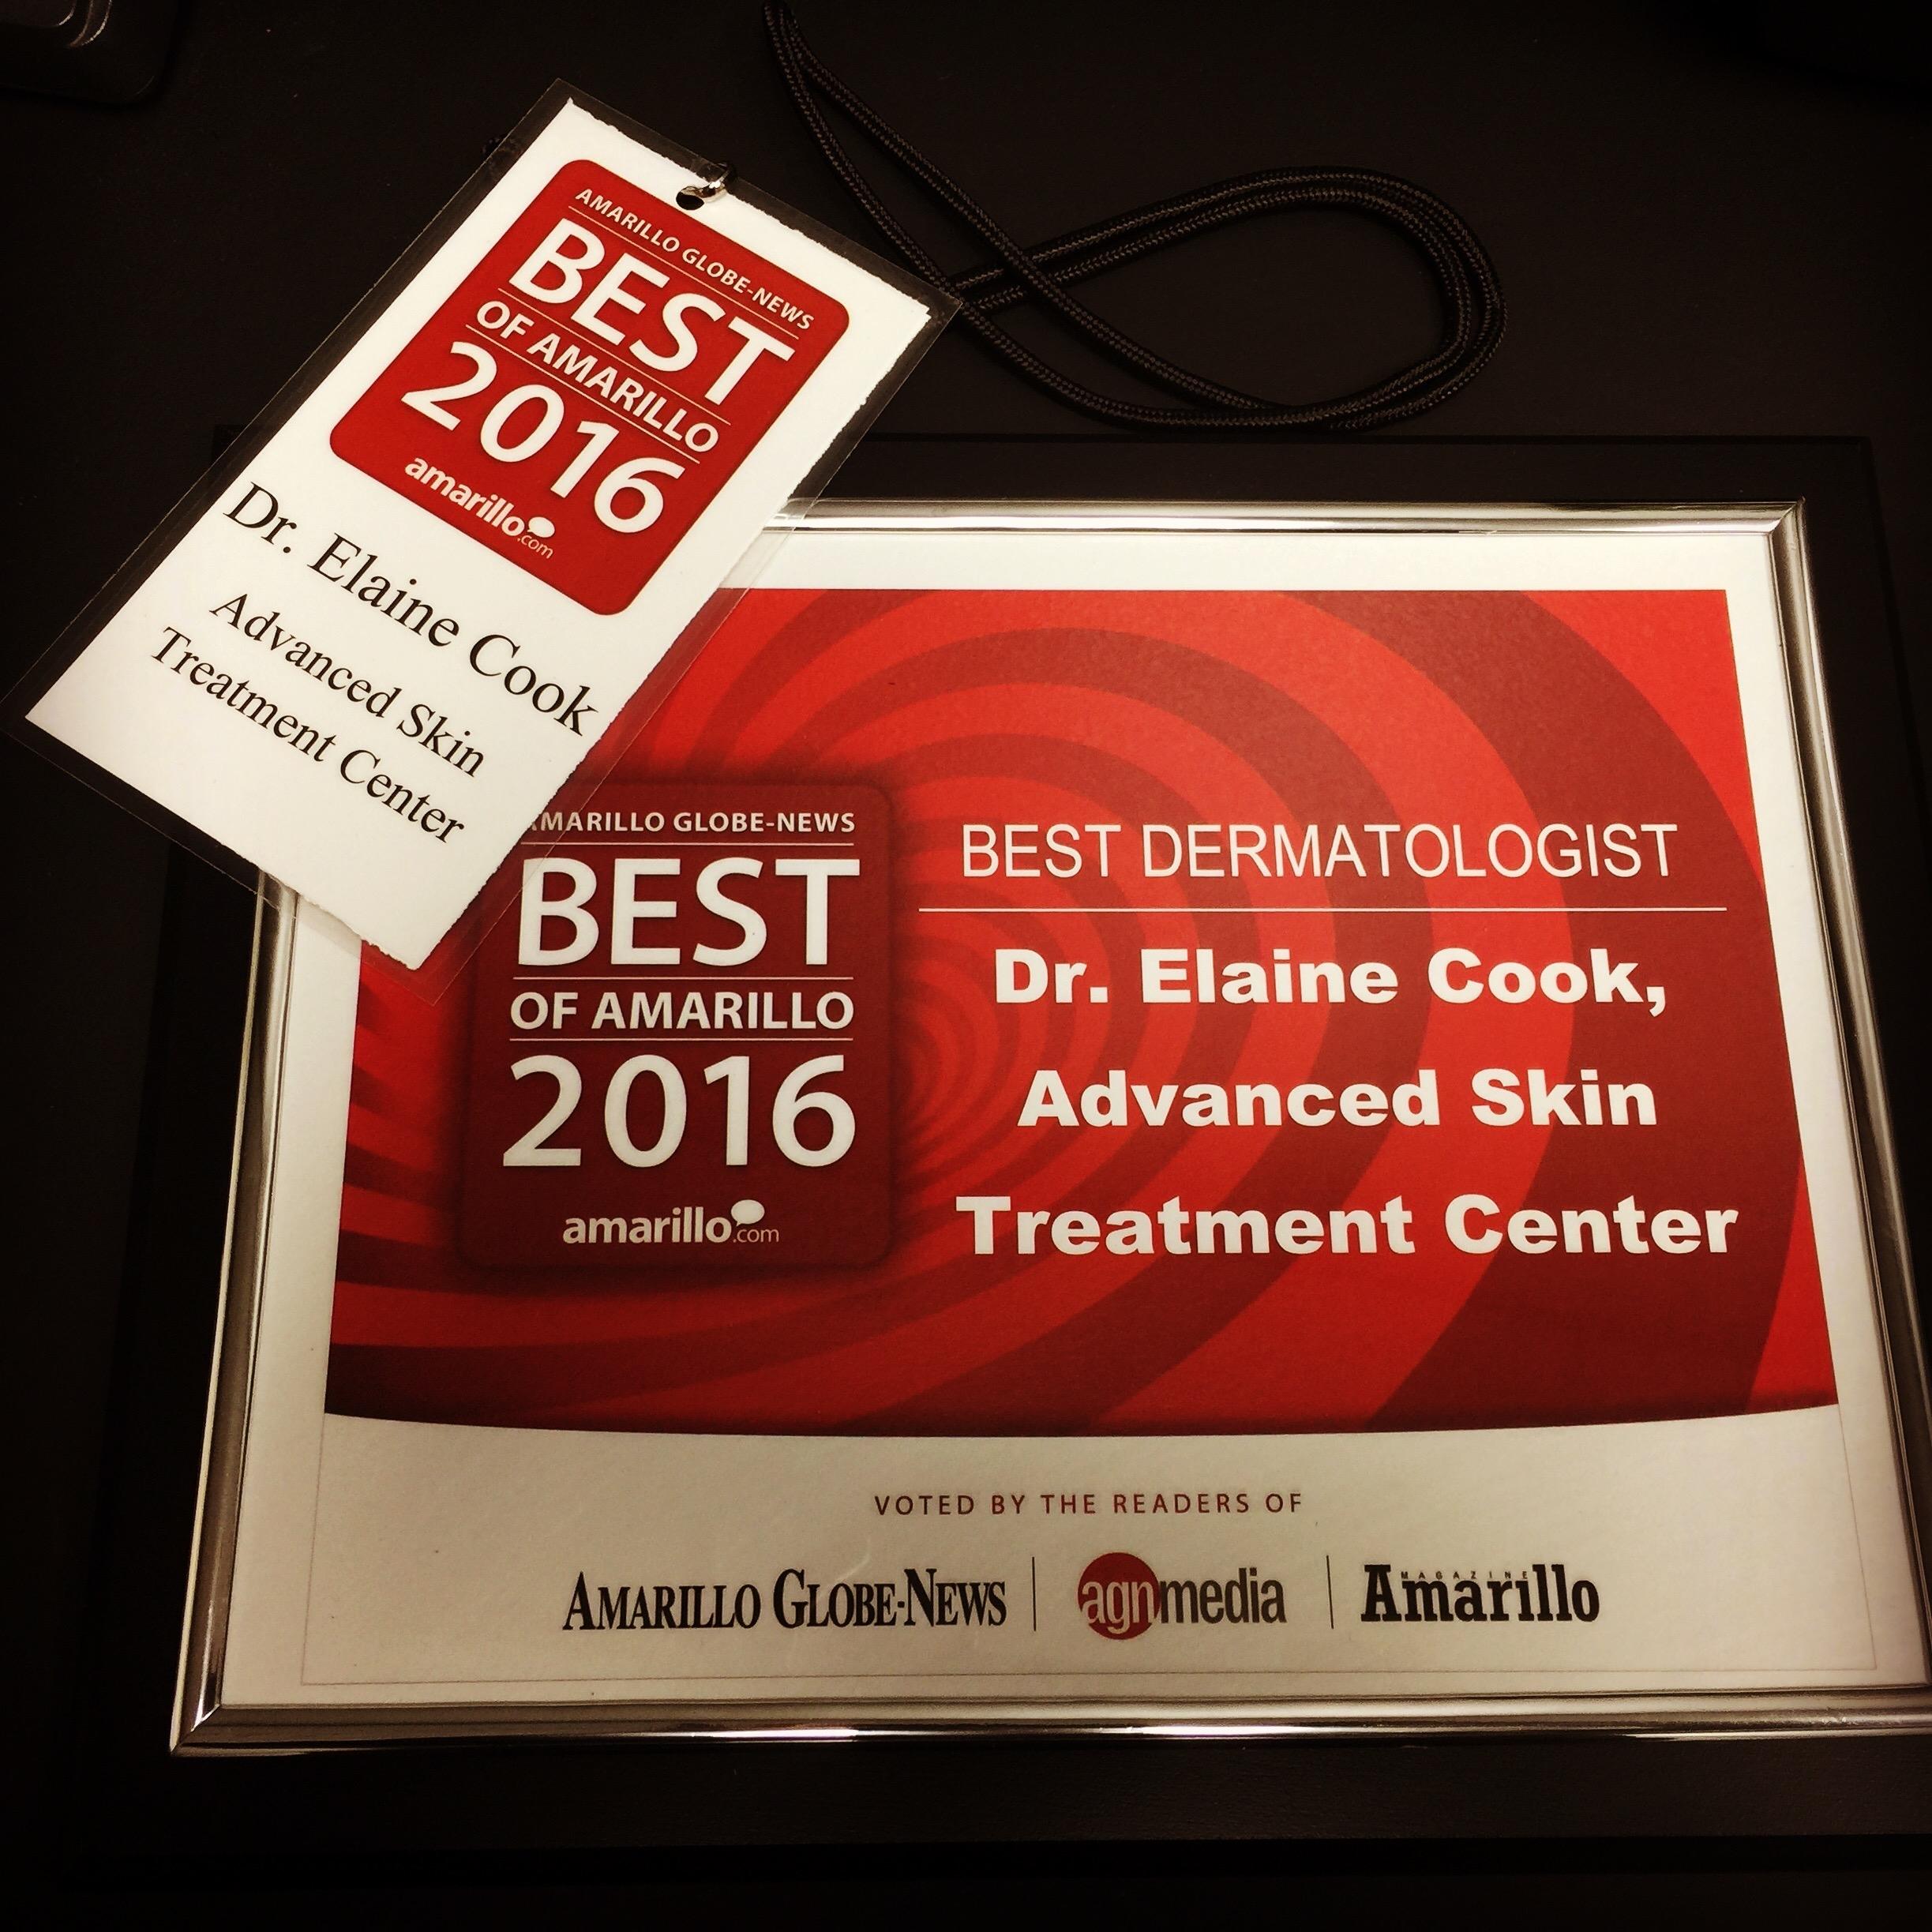 Elaine Cook MD, Advanced Skin Treatment Center image 4